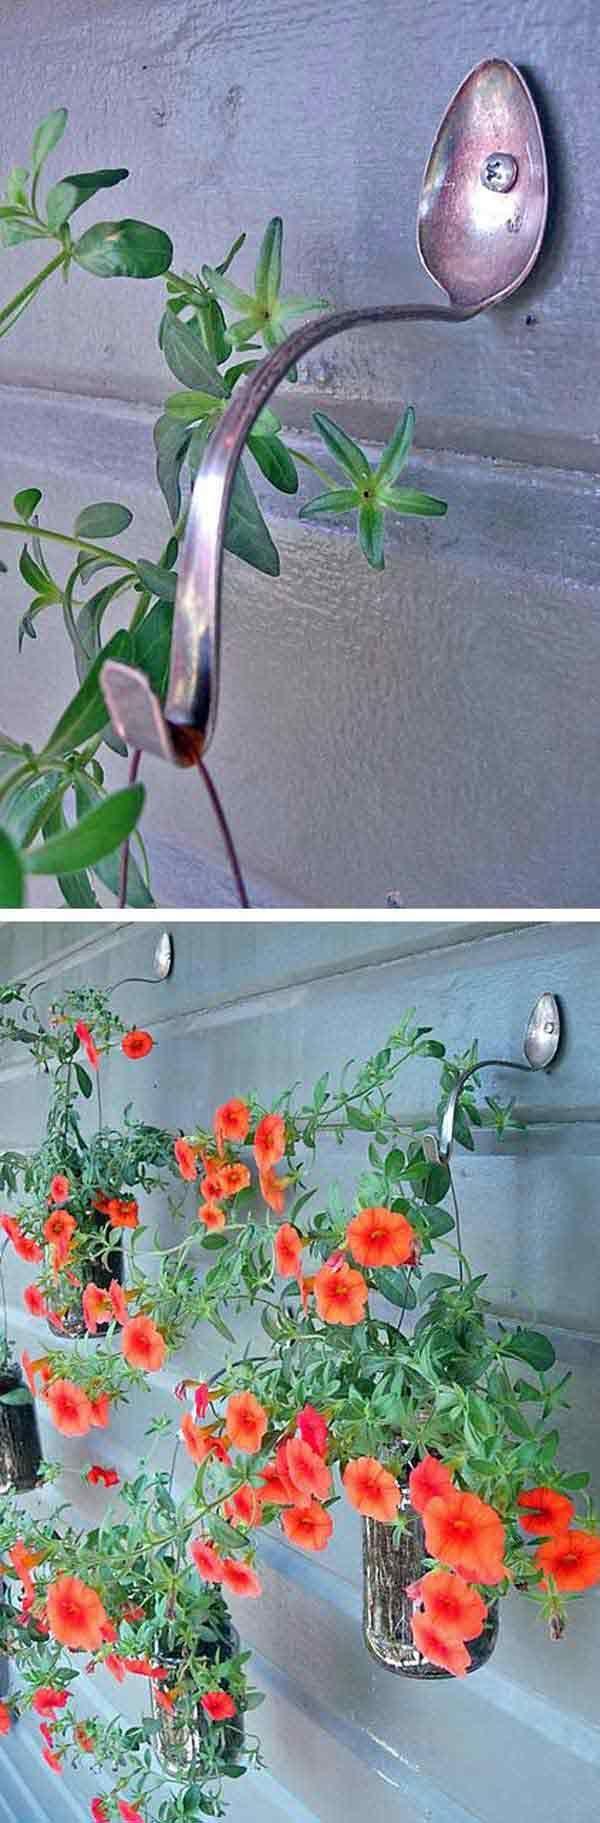 blumentopfhalter selber bauen, löffel als blumentopfhalter. genial! | diy gärten | pinterest, Design ideen